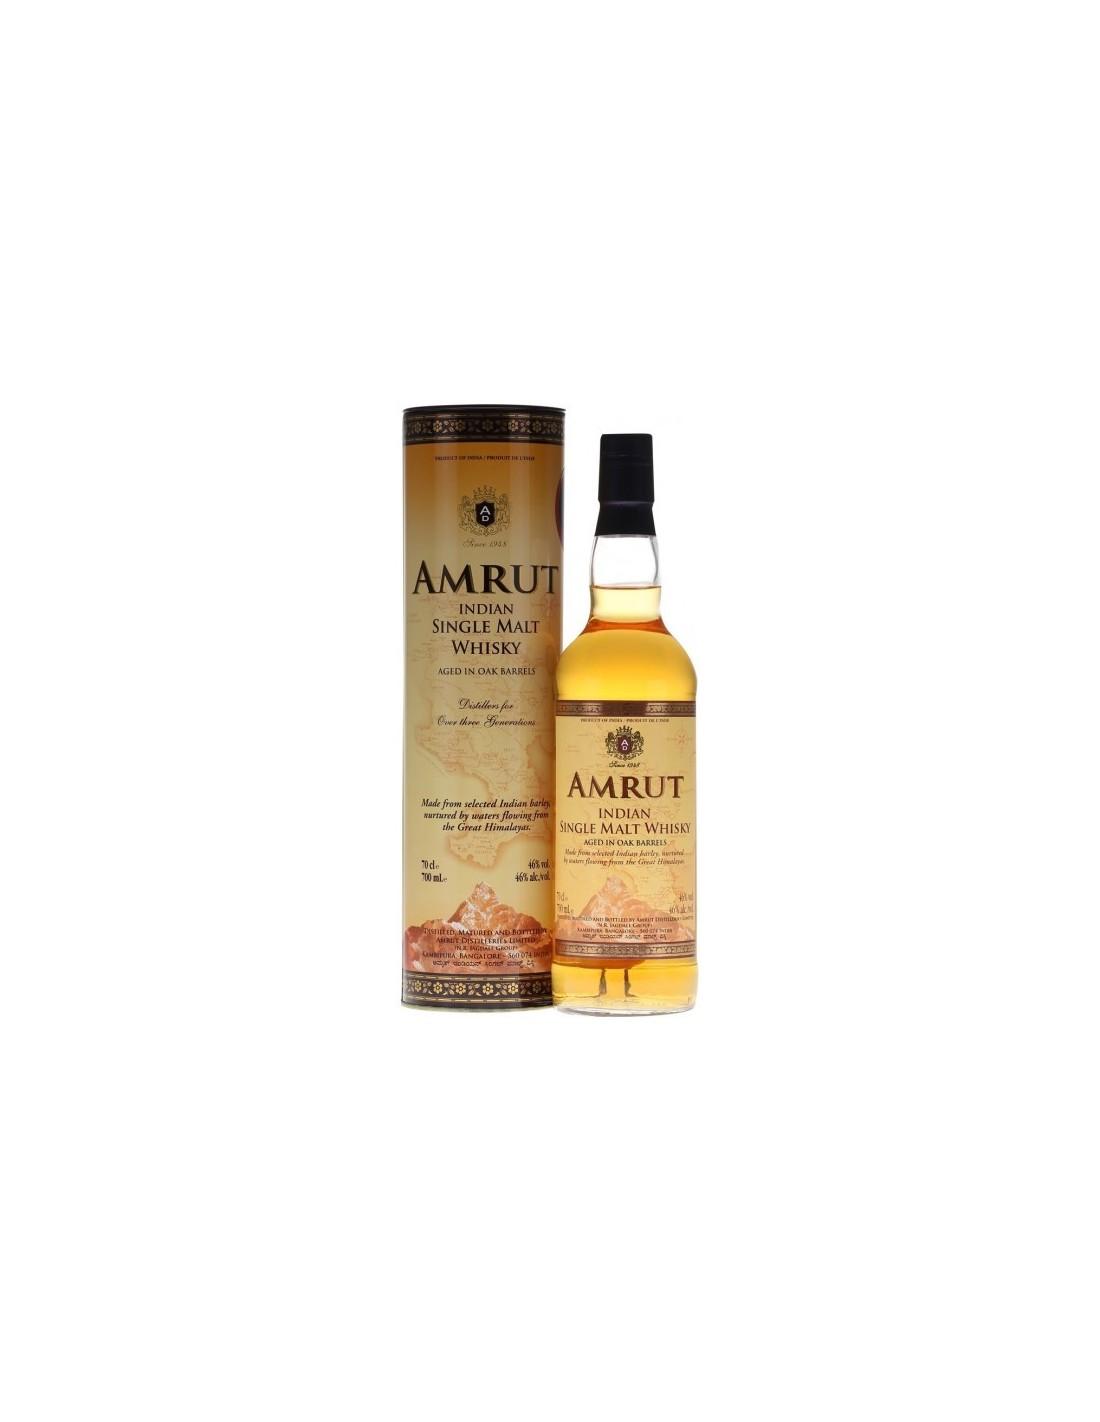 Whisky Amrut Indian Single Malt, 46% alc., 0.7L, India